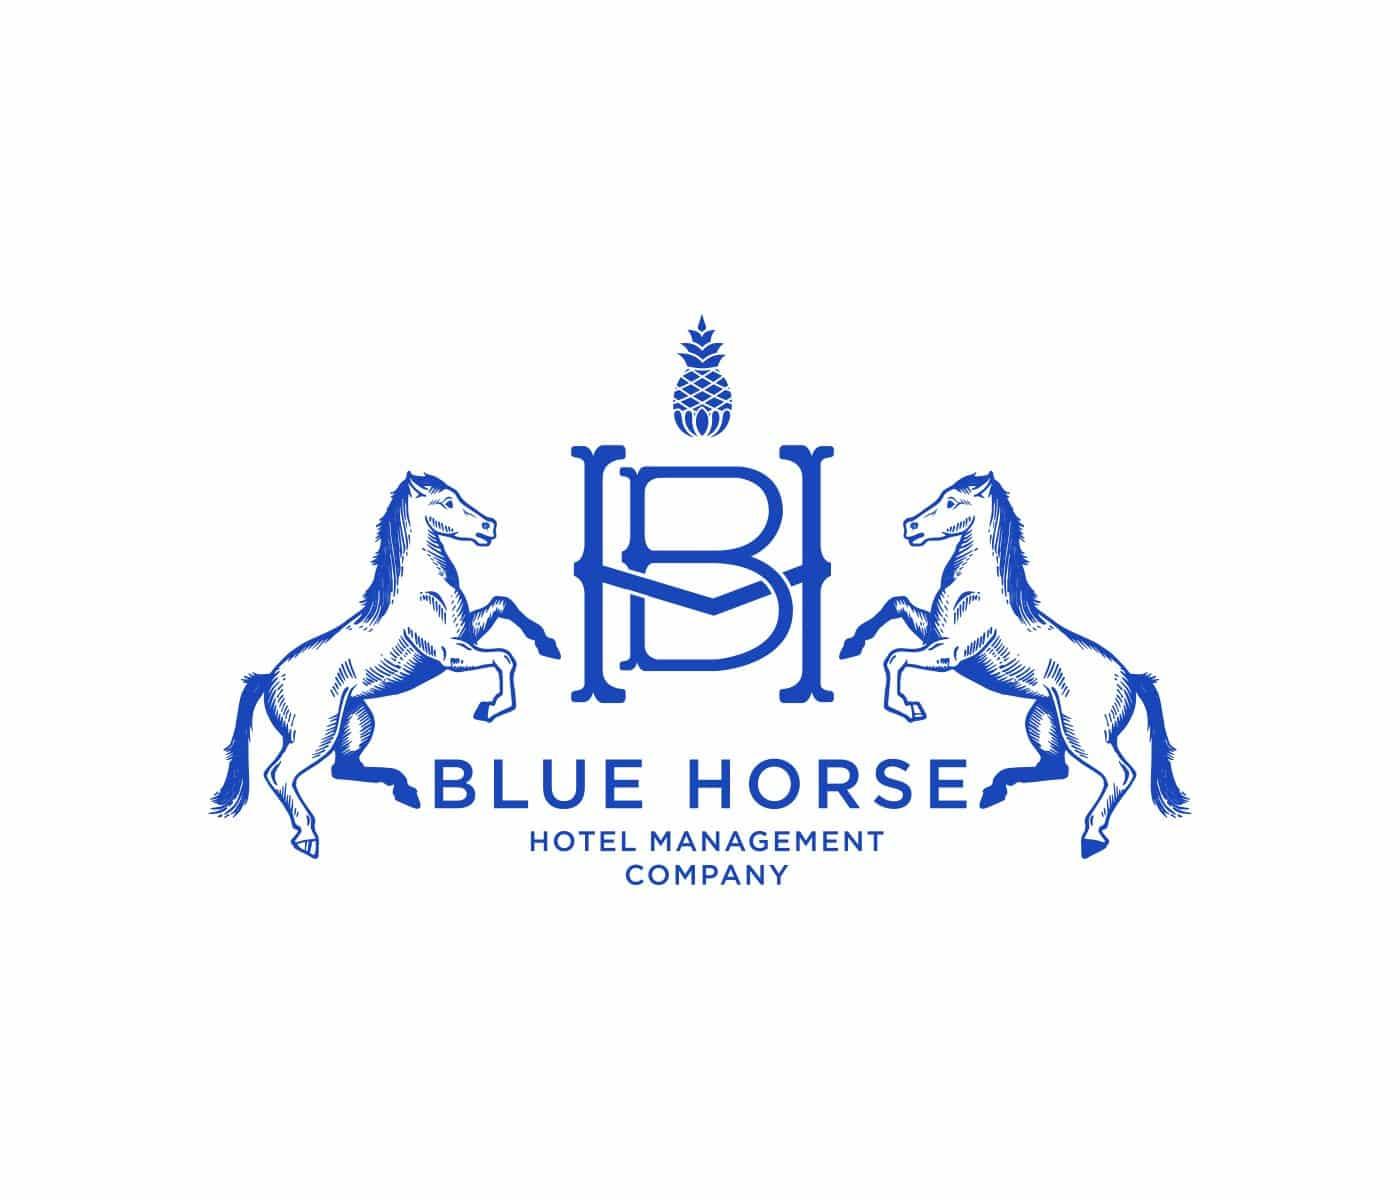 Blue Horse Hotel Management Company